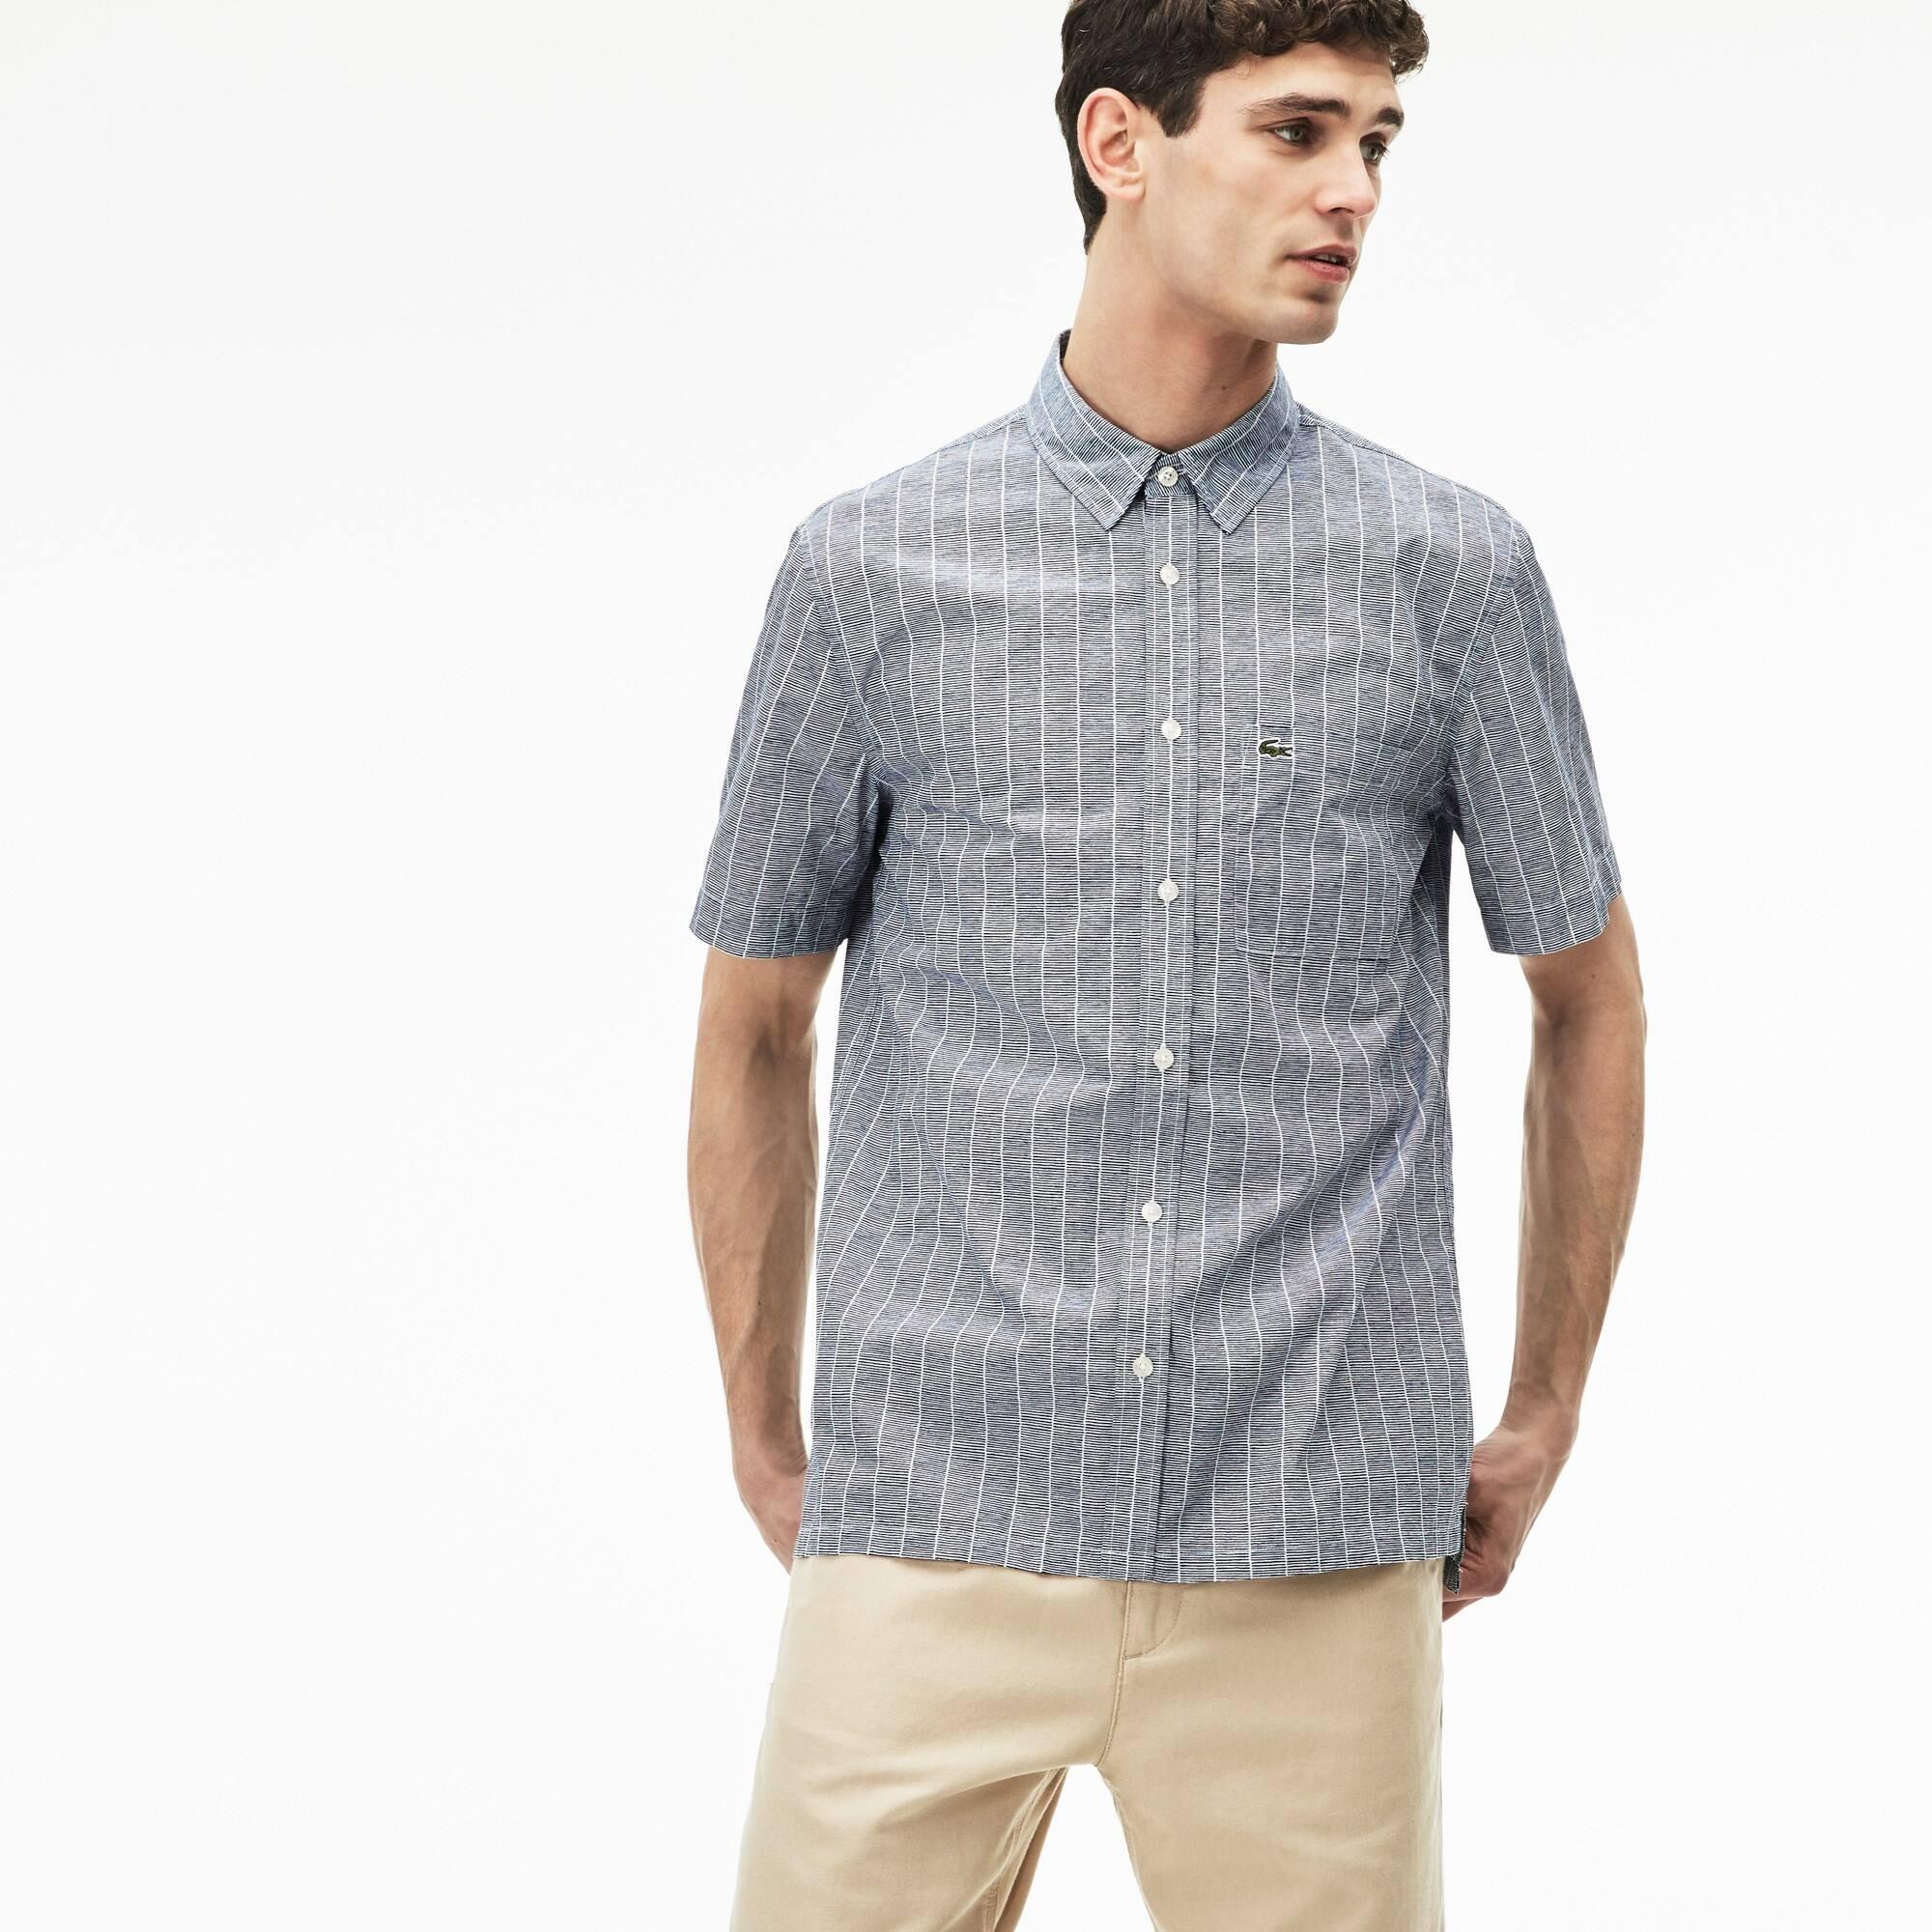 Camisa relax fit de manga curta em popelina impressa